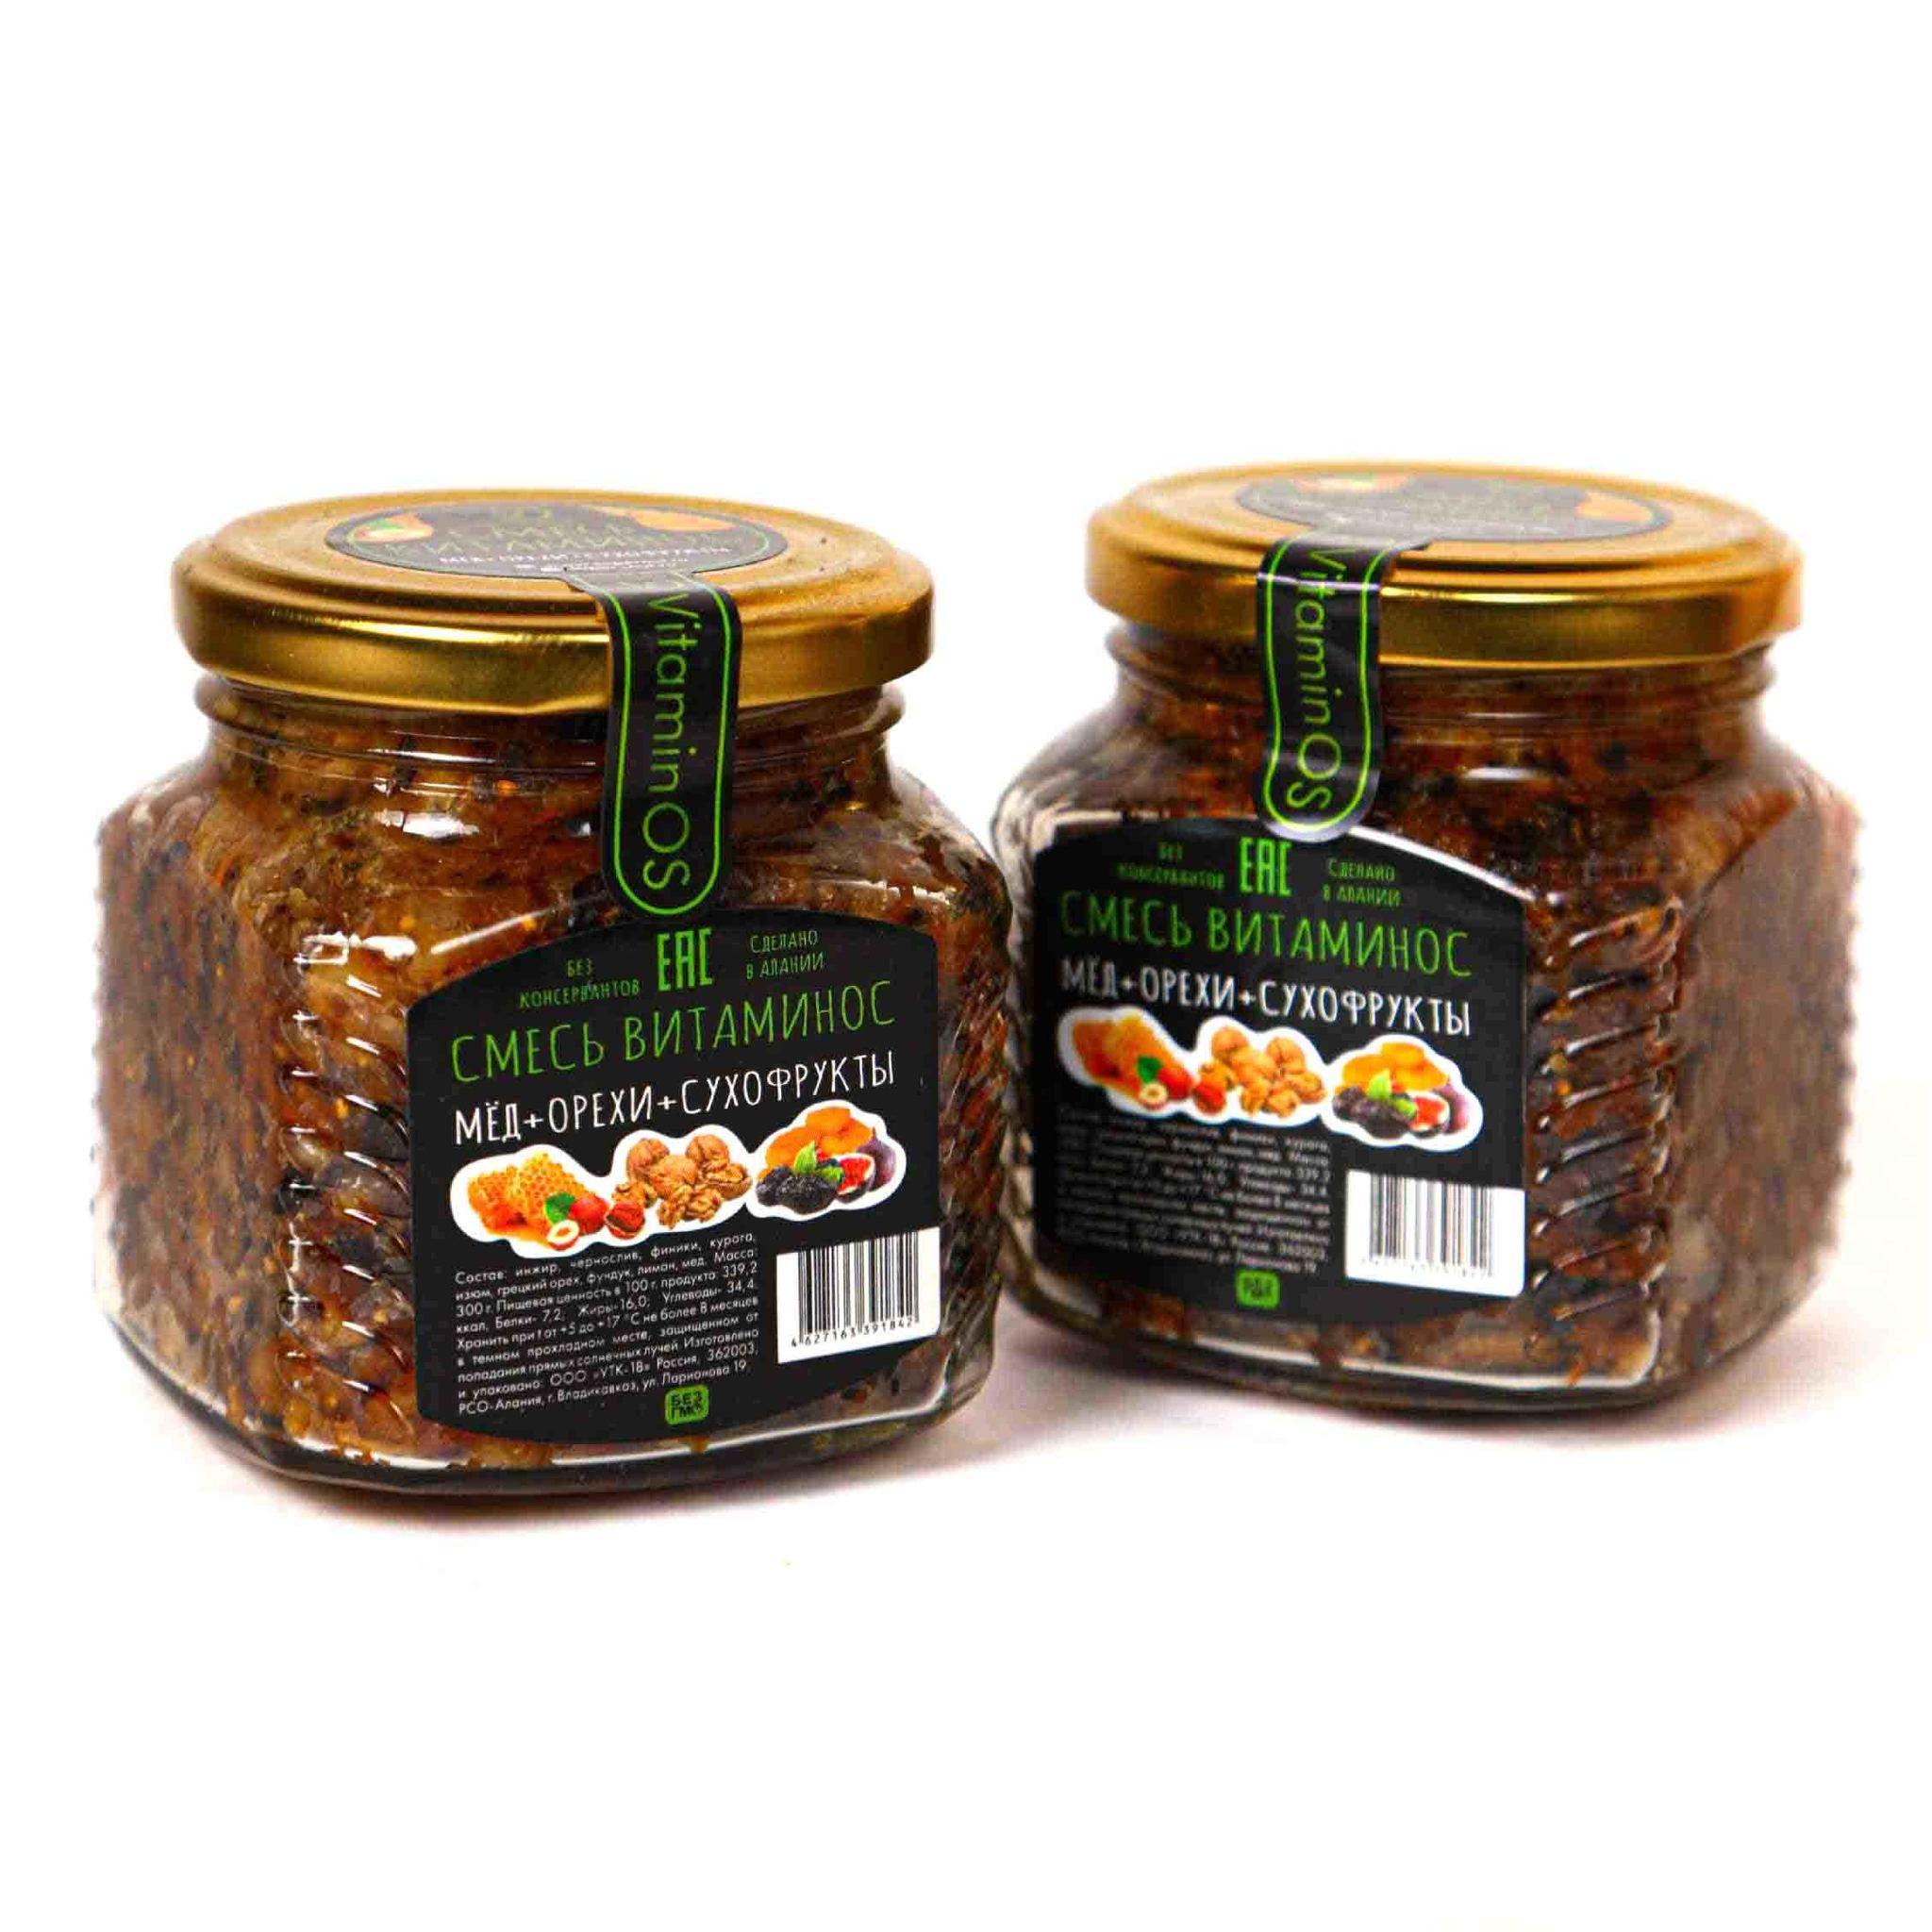 Сухофрукты Смесь витаминная с орехами, мёдом и сухофруктами, Supernut, 300 г import_files_a7_a7b256835ddf11eaa9c7484d7ecee297_7e34d58969ad11eaa9c7484d7ecee297.jpg